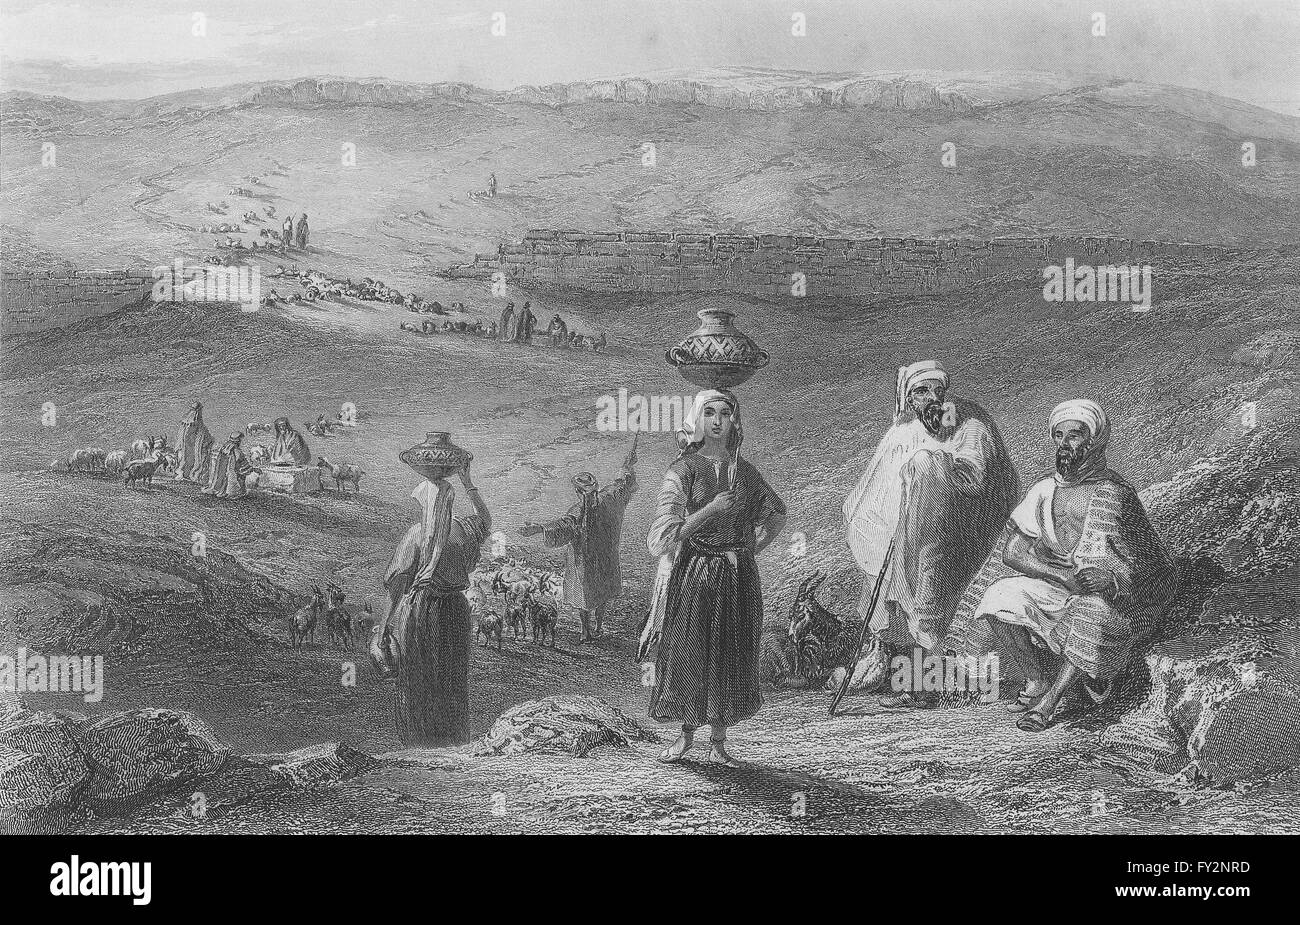 Bethel Israel: ISRAEL: Wells & Remains Of Pool, Bethel-Bartlett, Antique